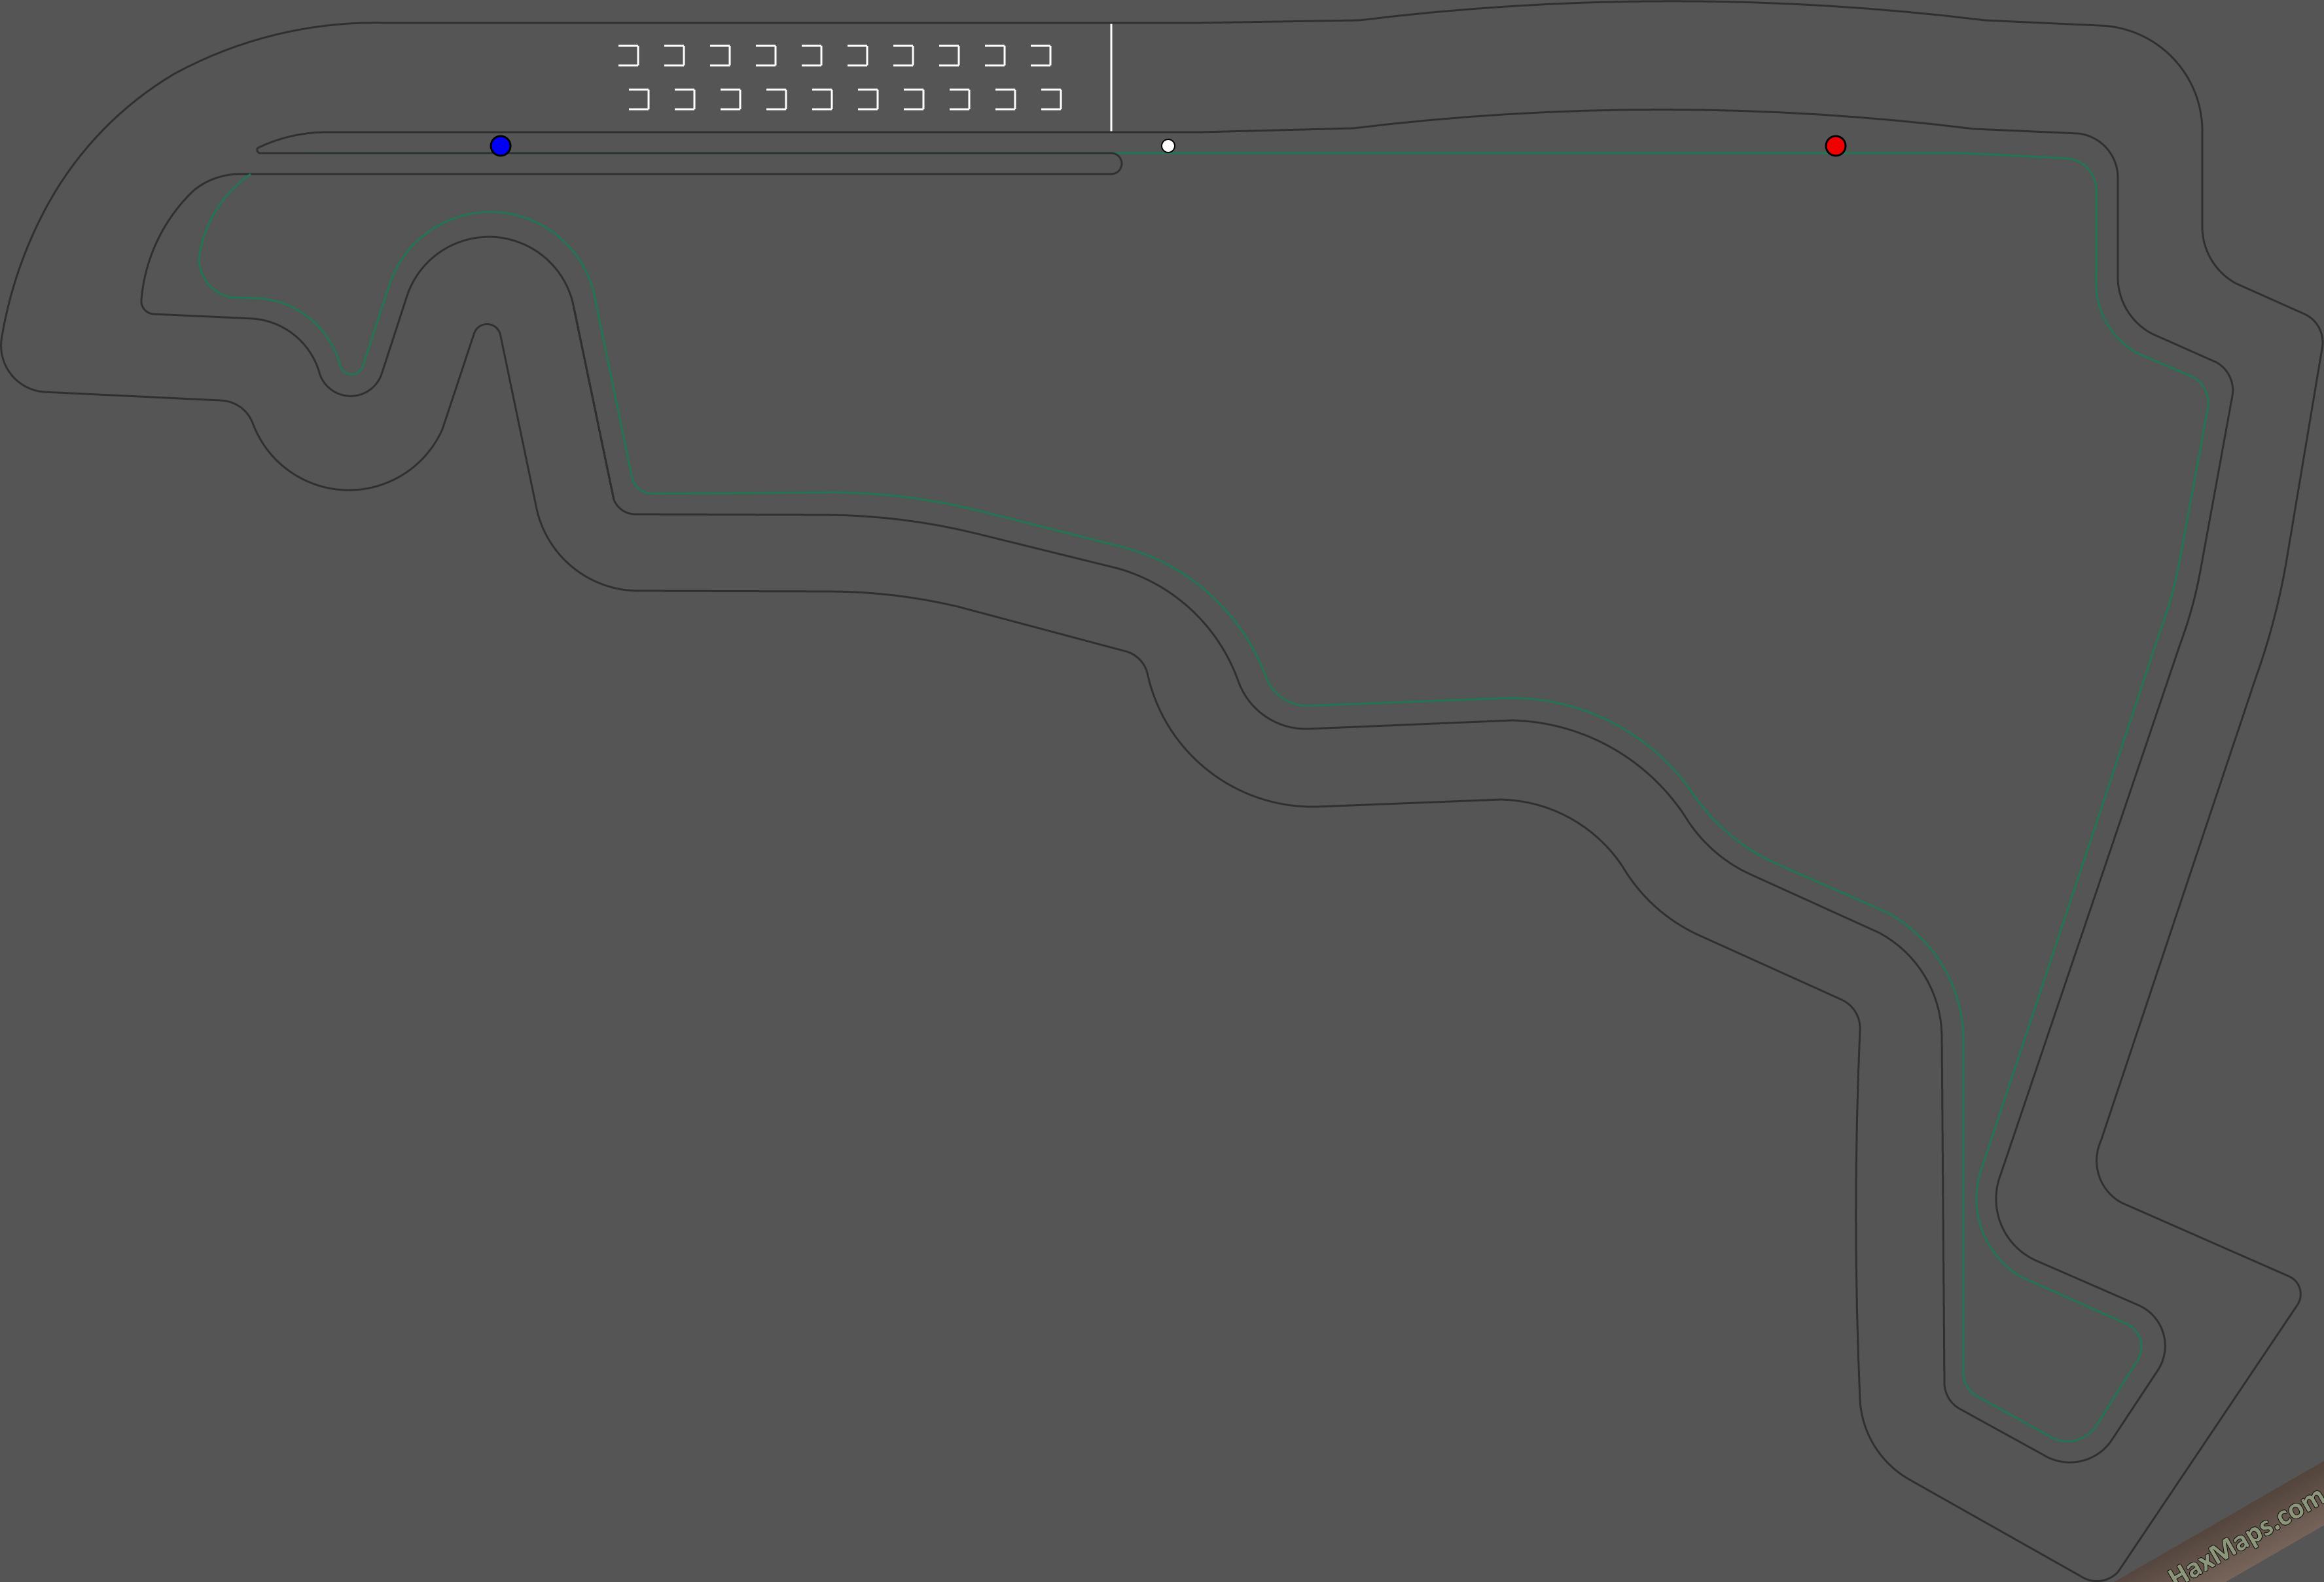 hax ball maps | Mexico City - Autodromo Hermanos Rodriguez by POPkORN